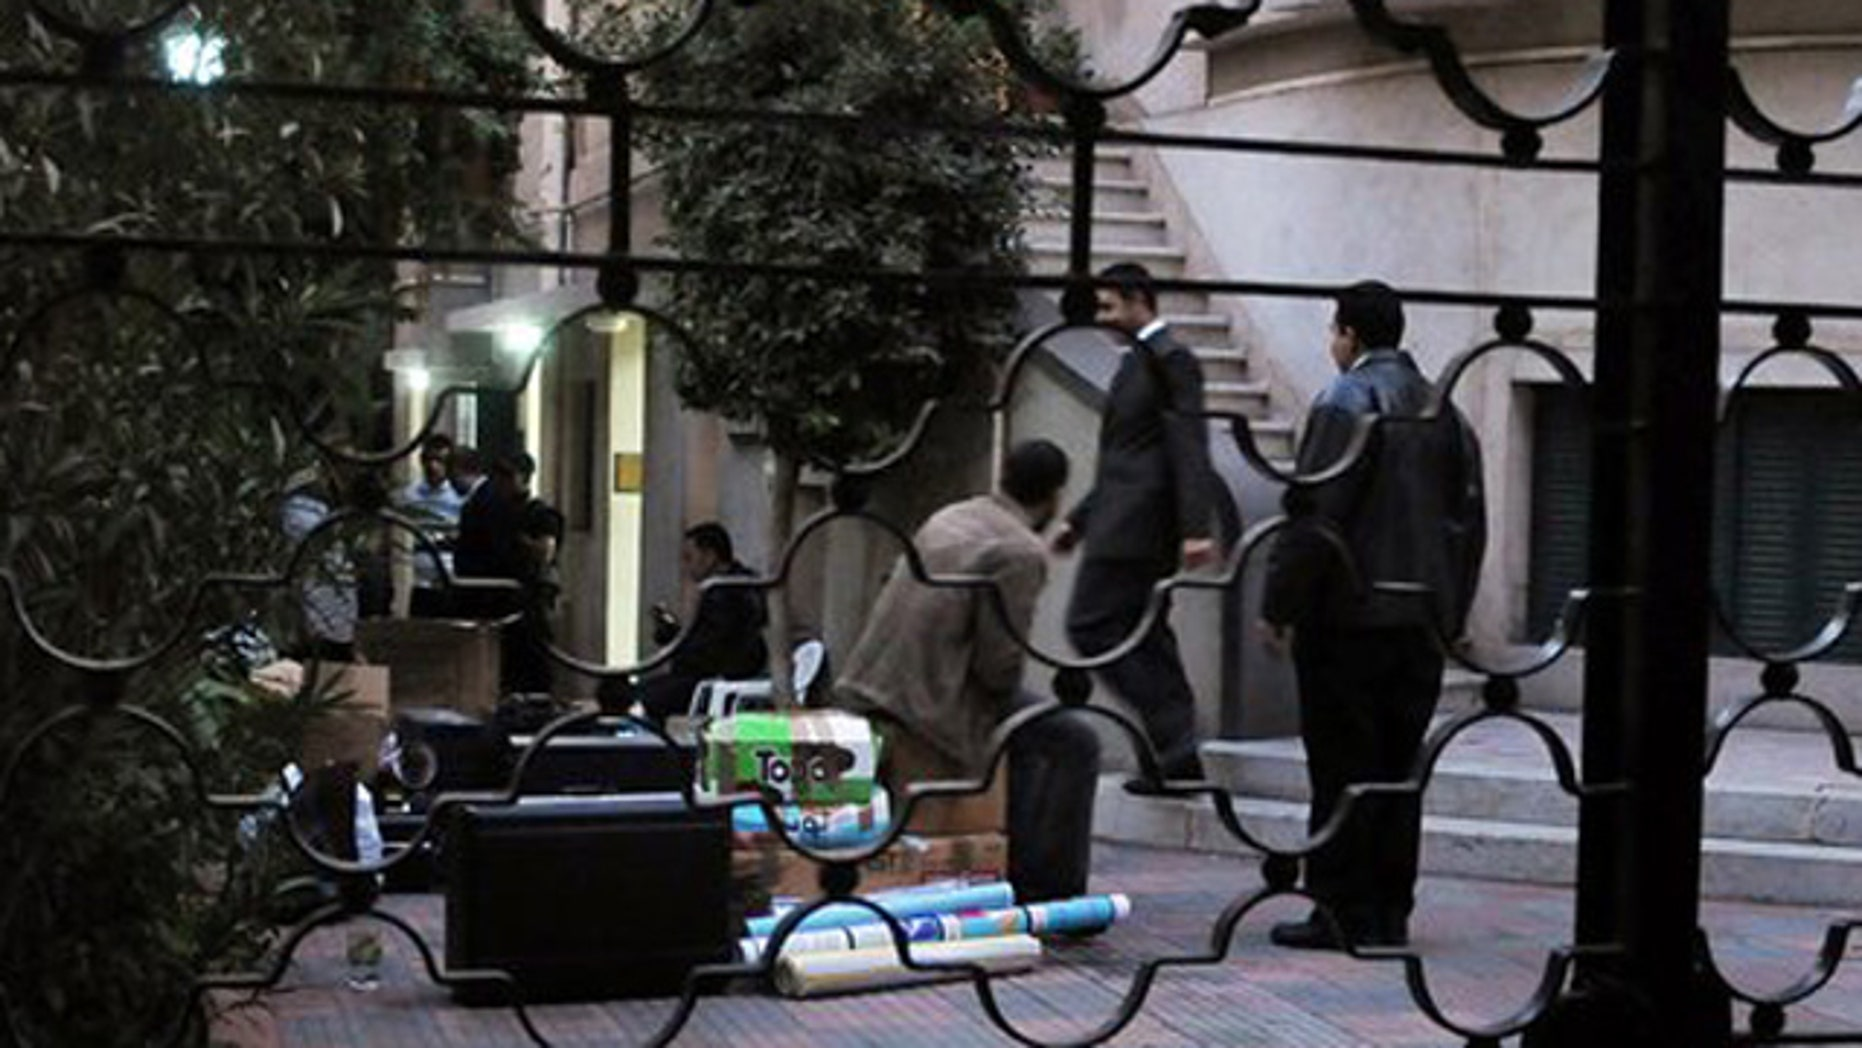 December 29, 2011: Egyptian police raid a non-governmental organization office in Cairo, Egypt.